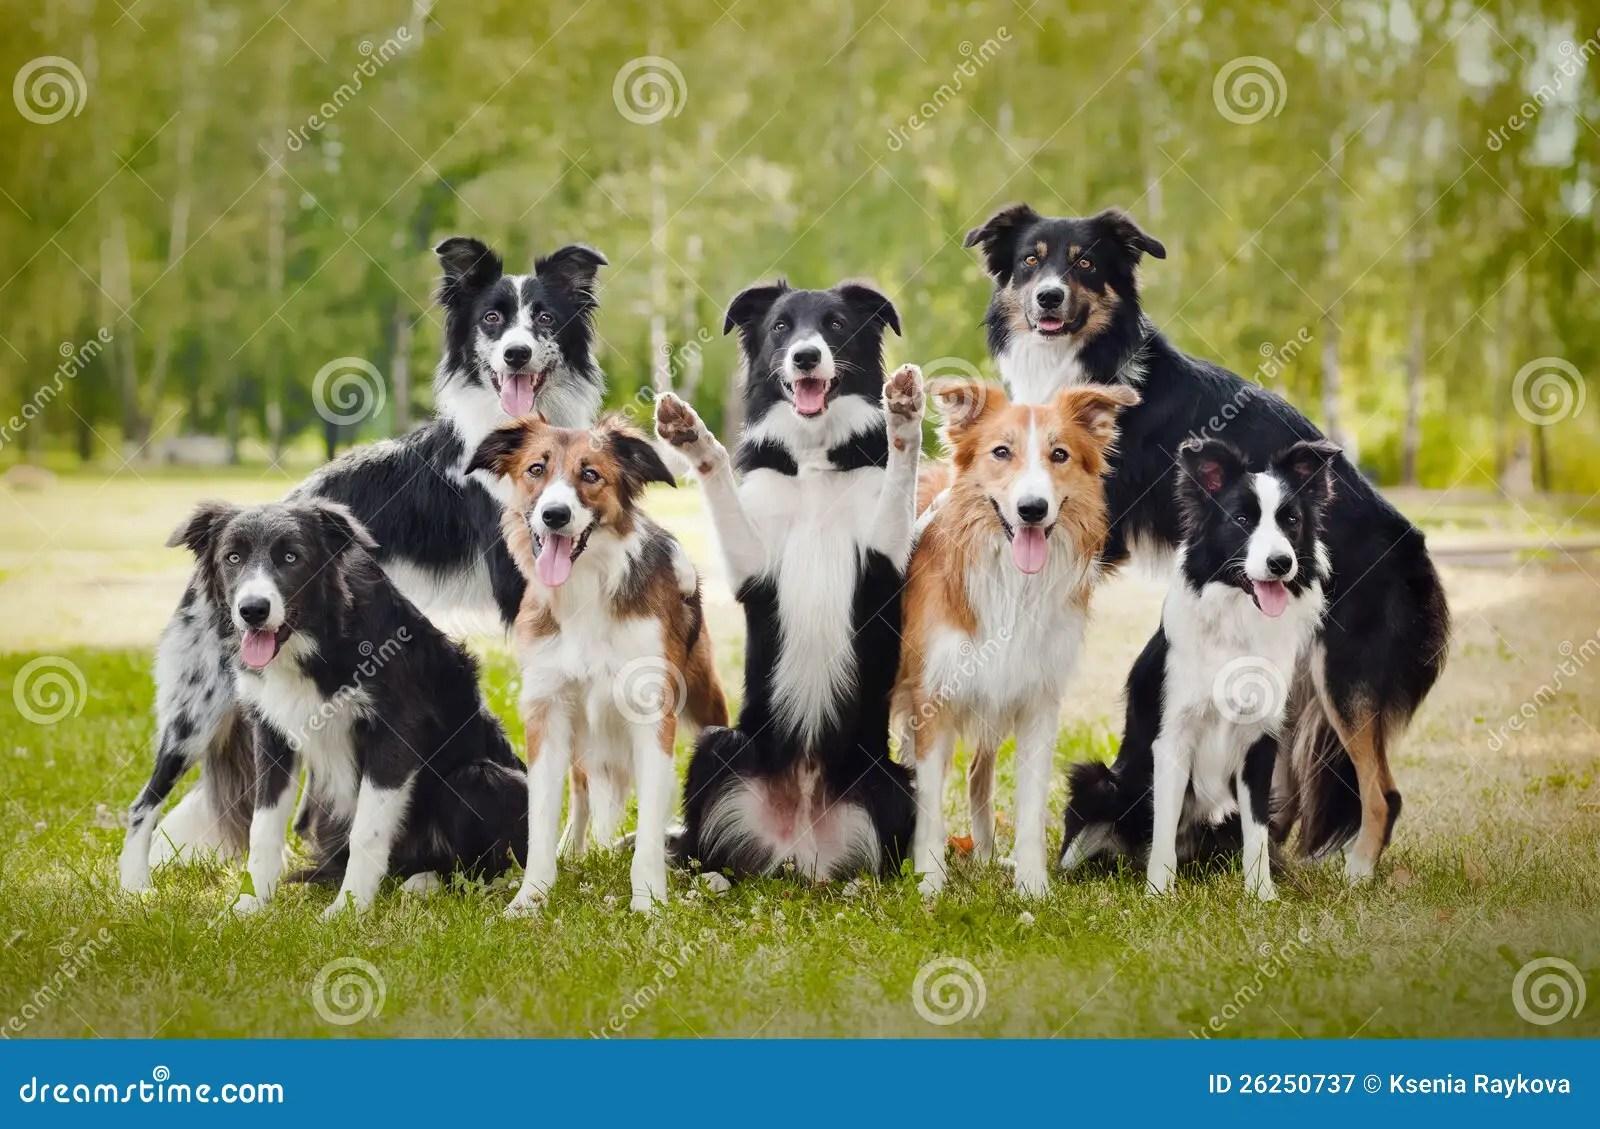 Cute Owl Wallpaper Border Group Of Happy Dogs Stock Image Image Of Medium Mammal